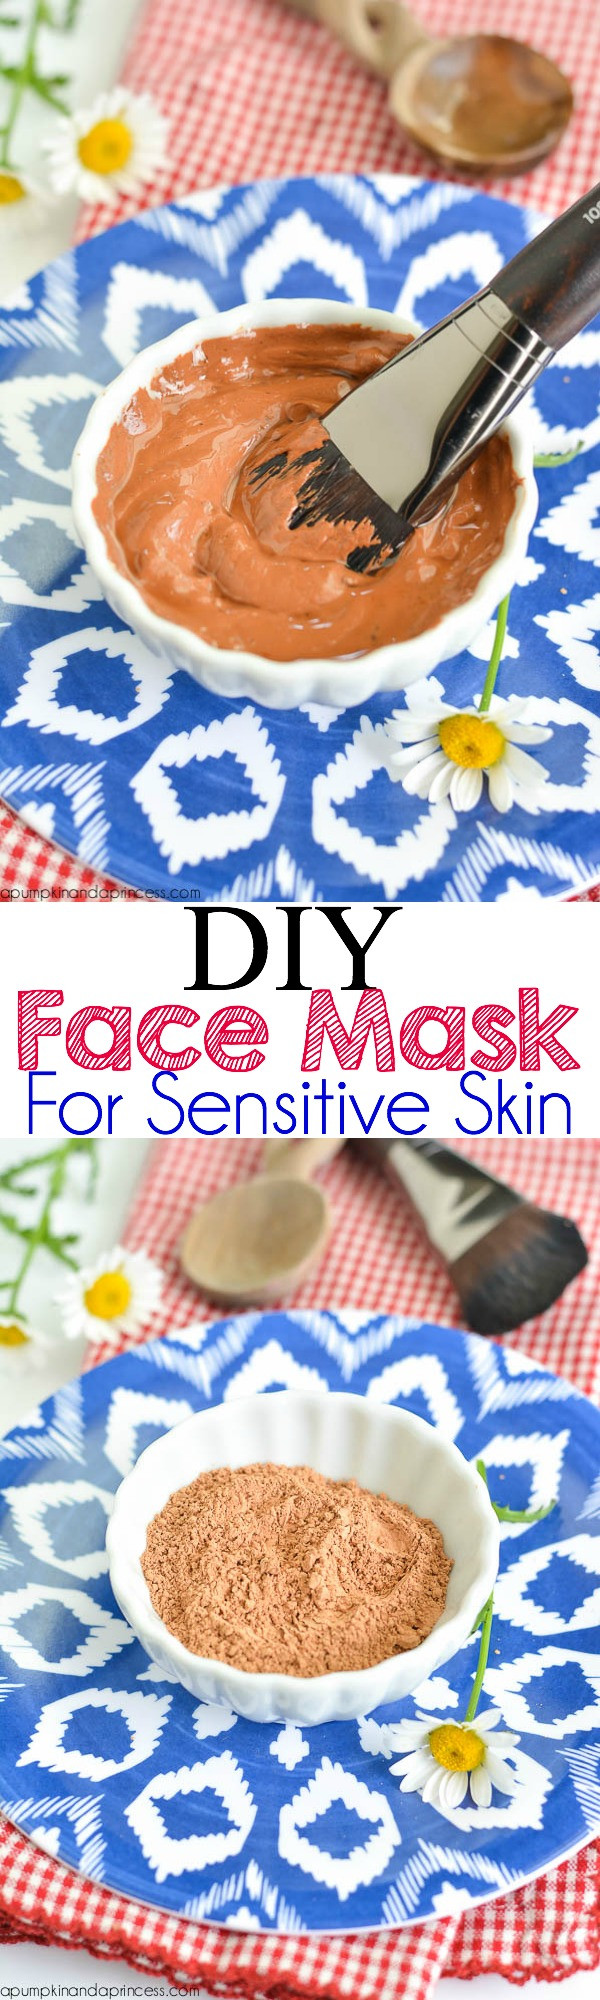 Best ideas about DIY Face Mask For Sensitive Skin . Save or Pin DIY Face Mask For Sensitive Skin A Pumpkin And A Princess Now.